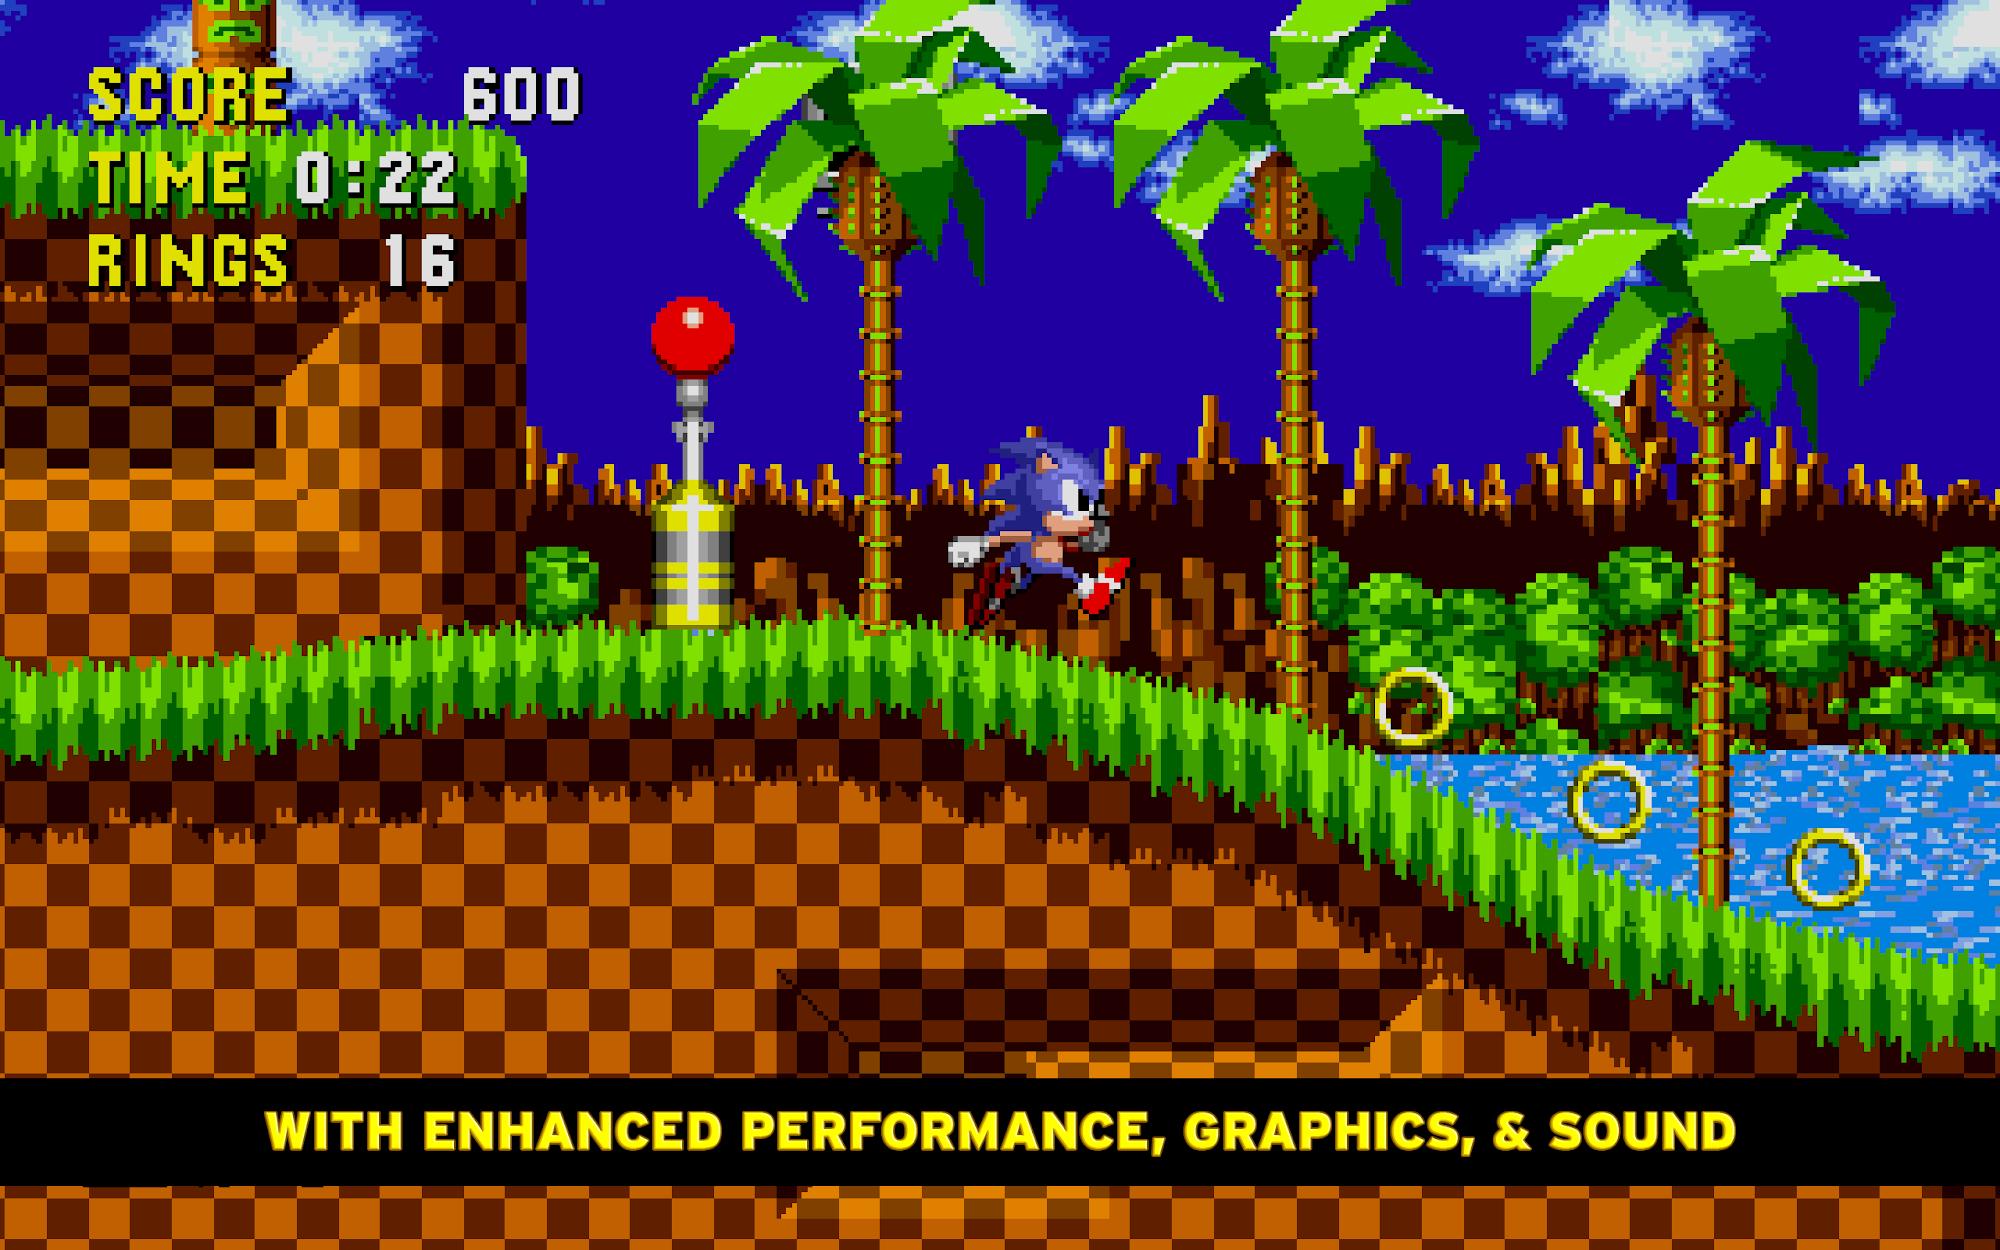 Sonic The Hedgehog screenshot #12